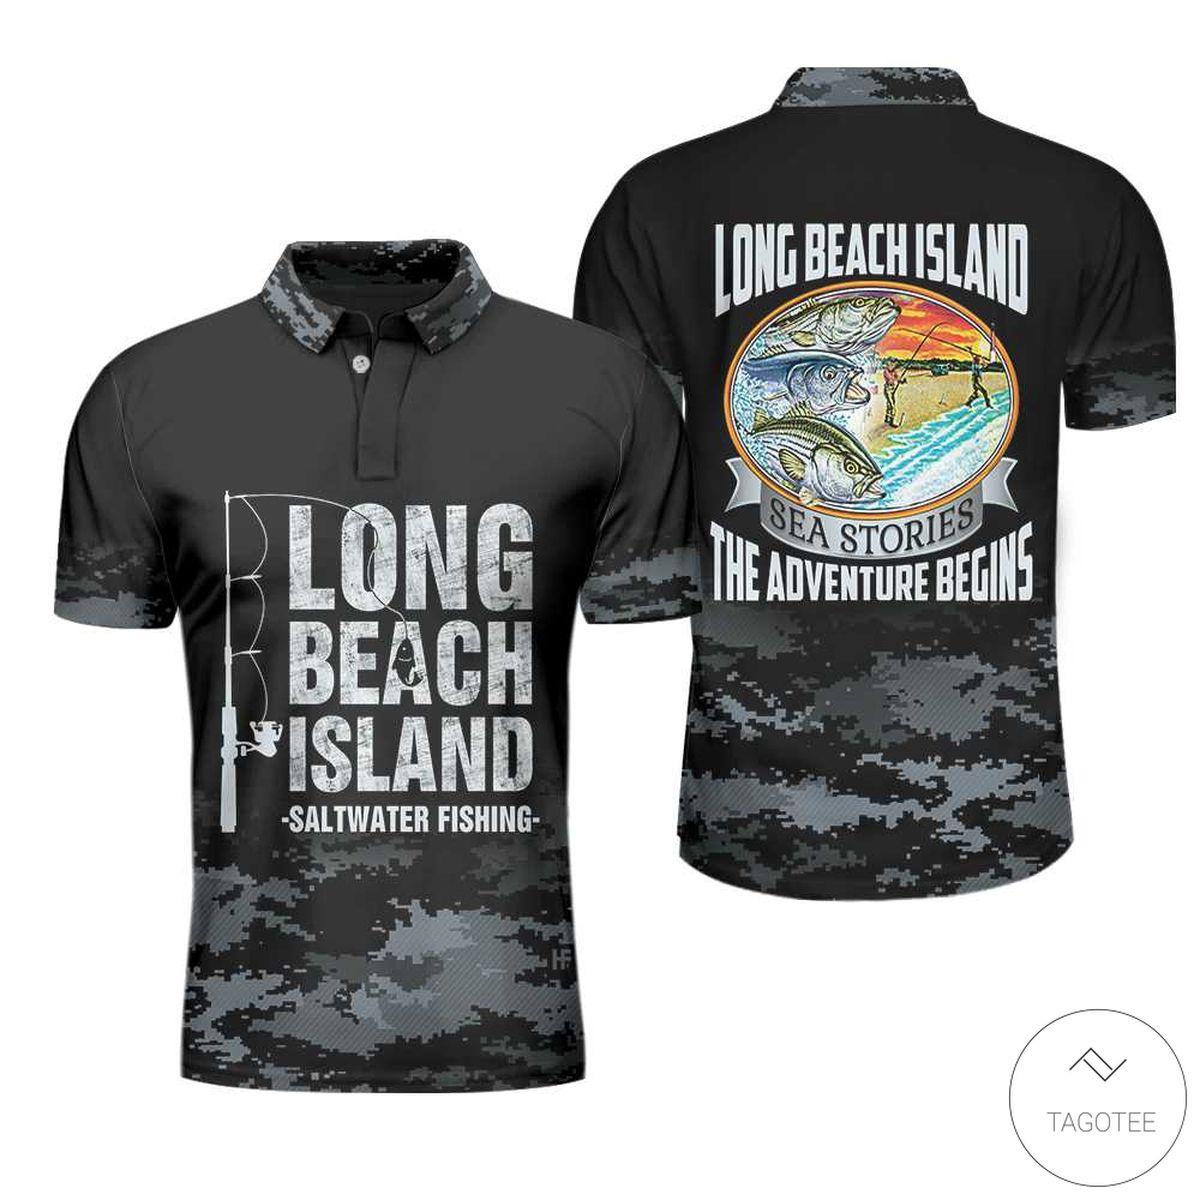 Long-Beach-IslAnd-Saltwater-Fishing-Polo-Shirtx